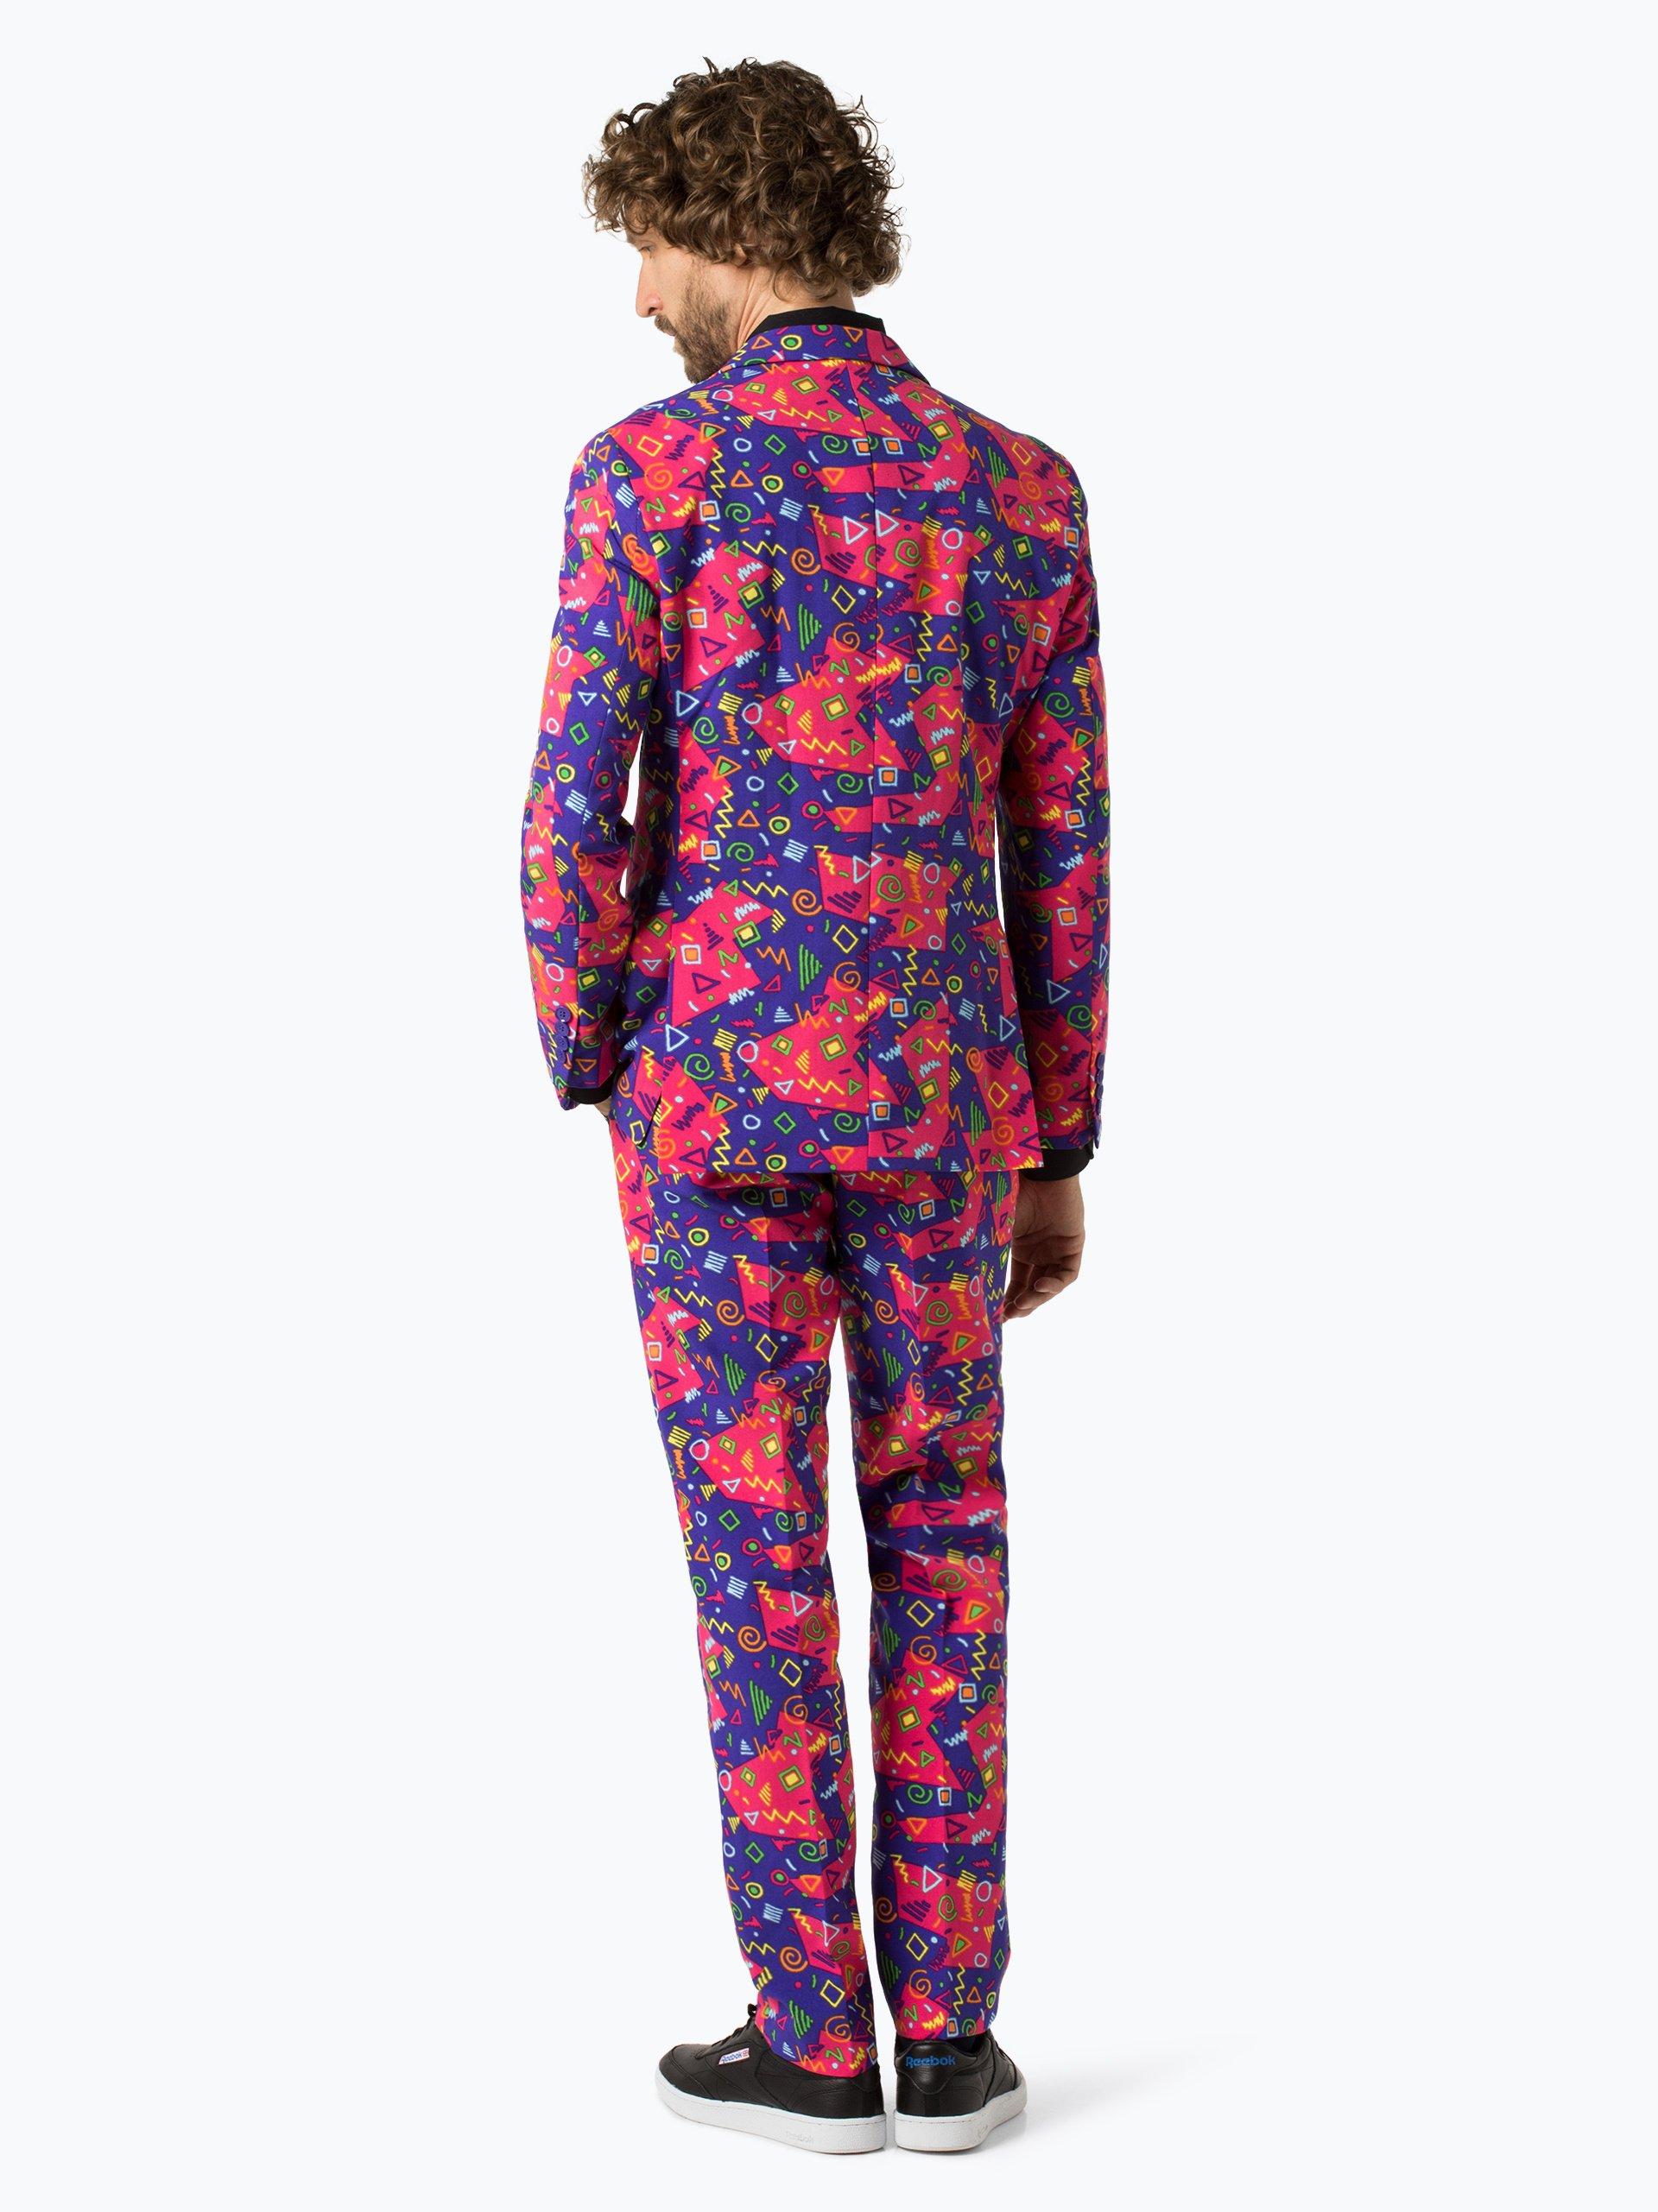 opposuits herren anzug mit krawatte pink gemustert online. Black Bedroom Furniture Sets. Home Design Ideas